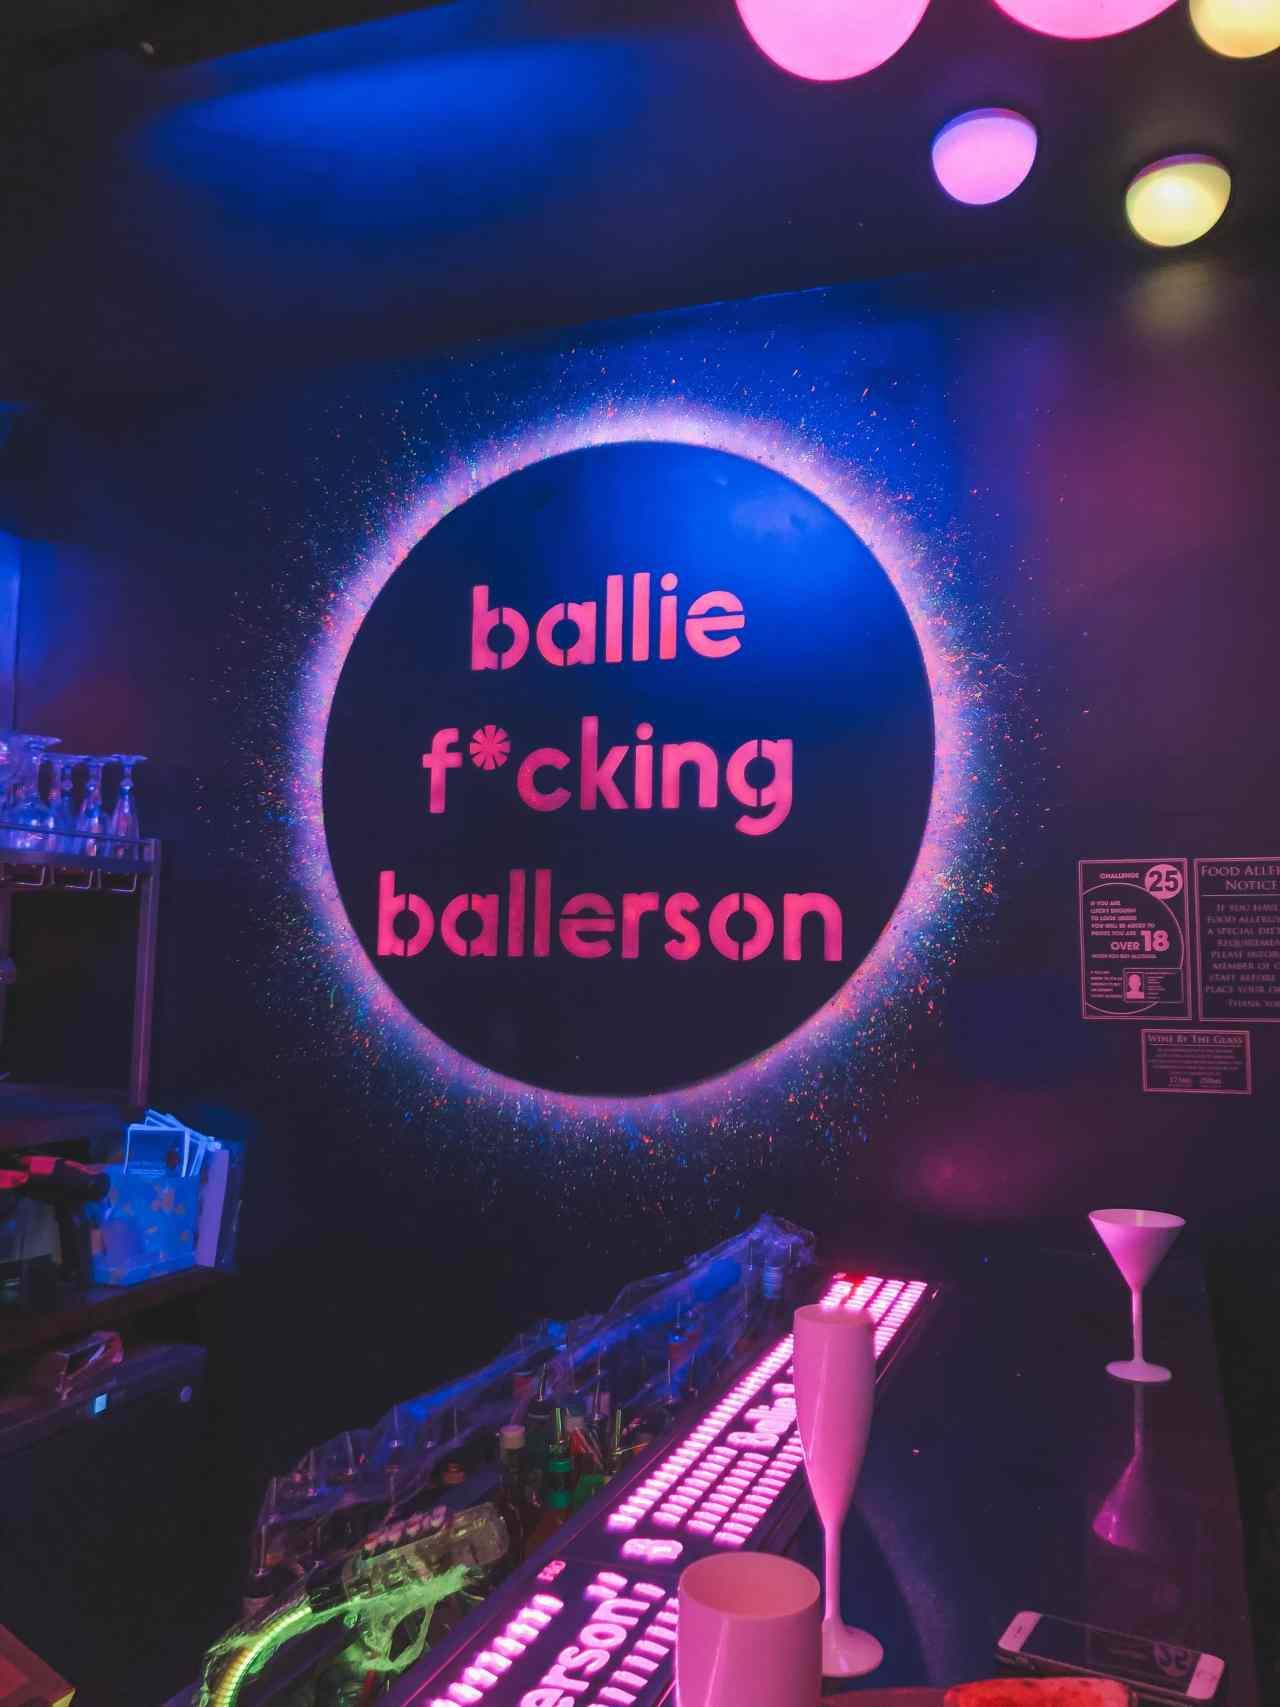 BallieBallerson soho